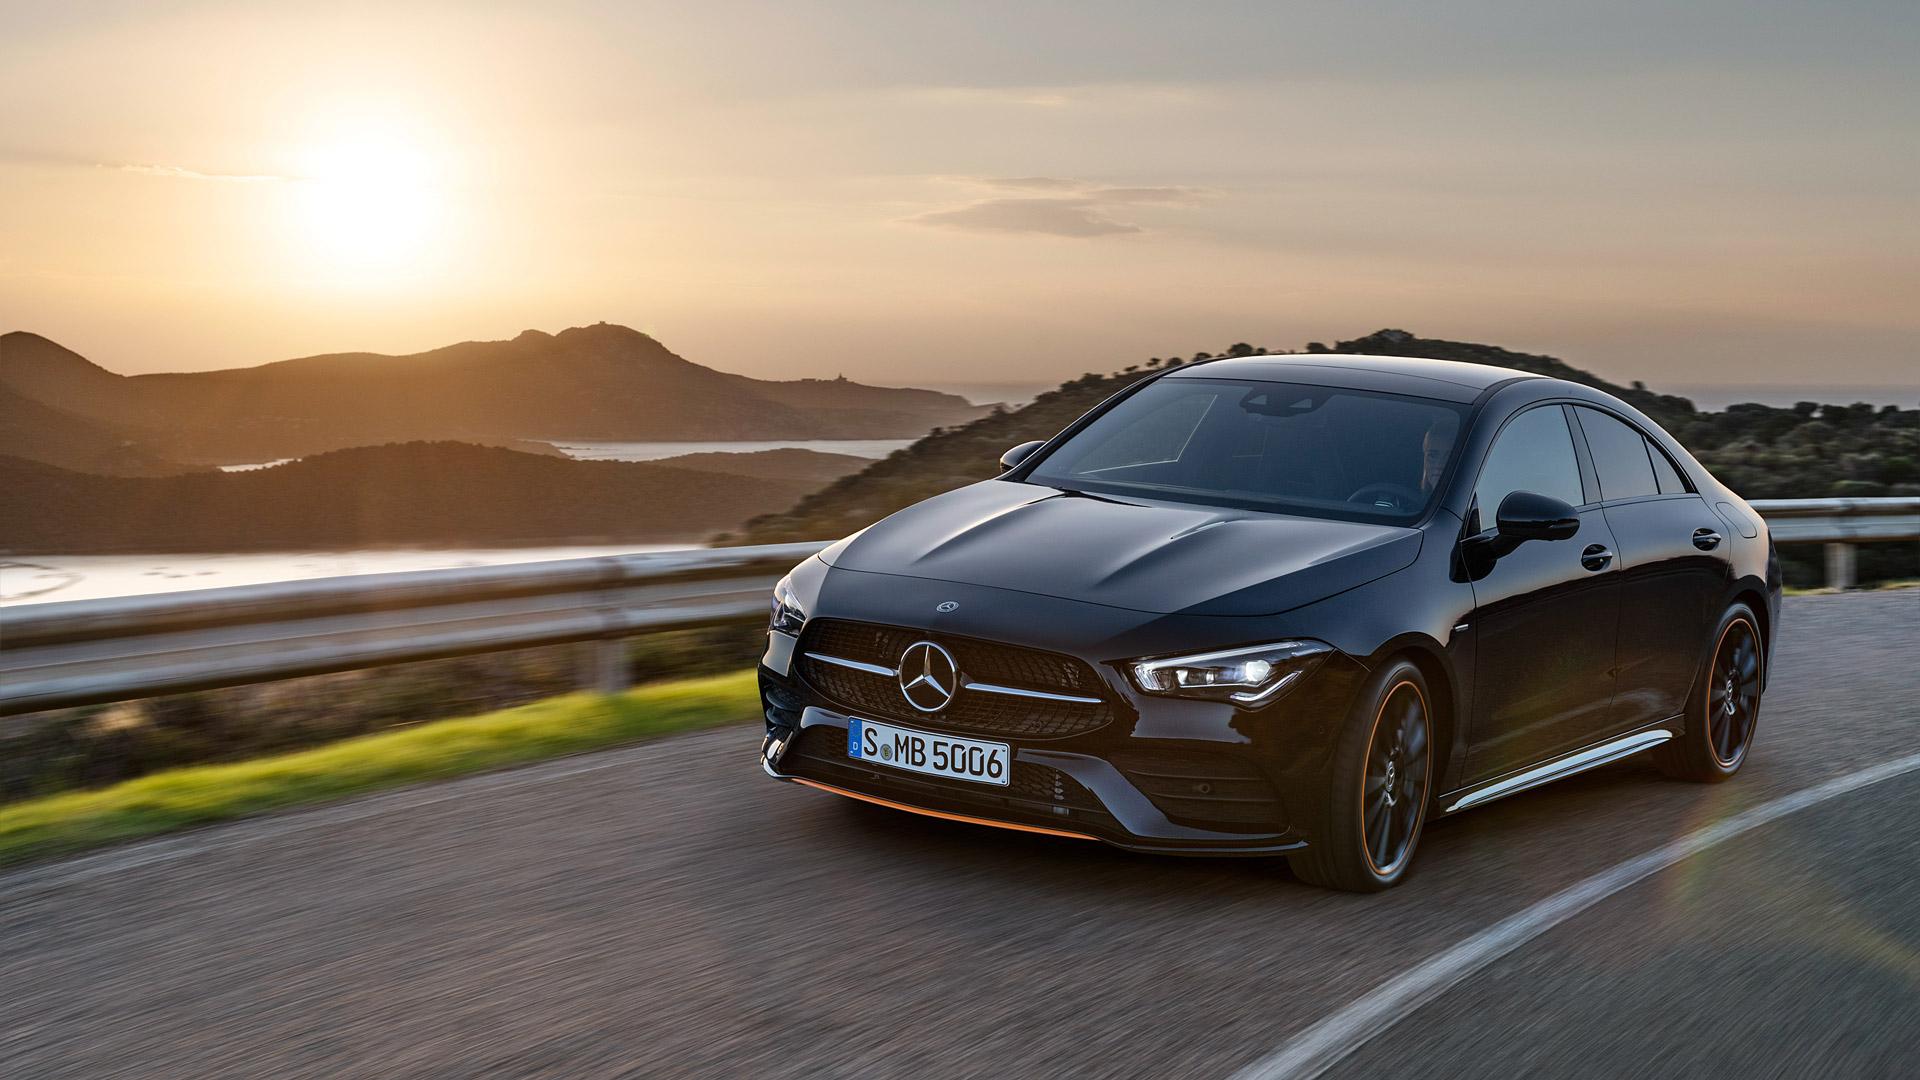 2020 Mercedes Benz CLA Wallpapers Specs Videos   4K HD   WSupercars 1920x1080